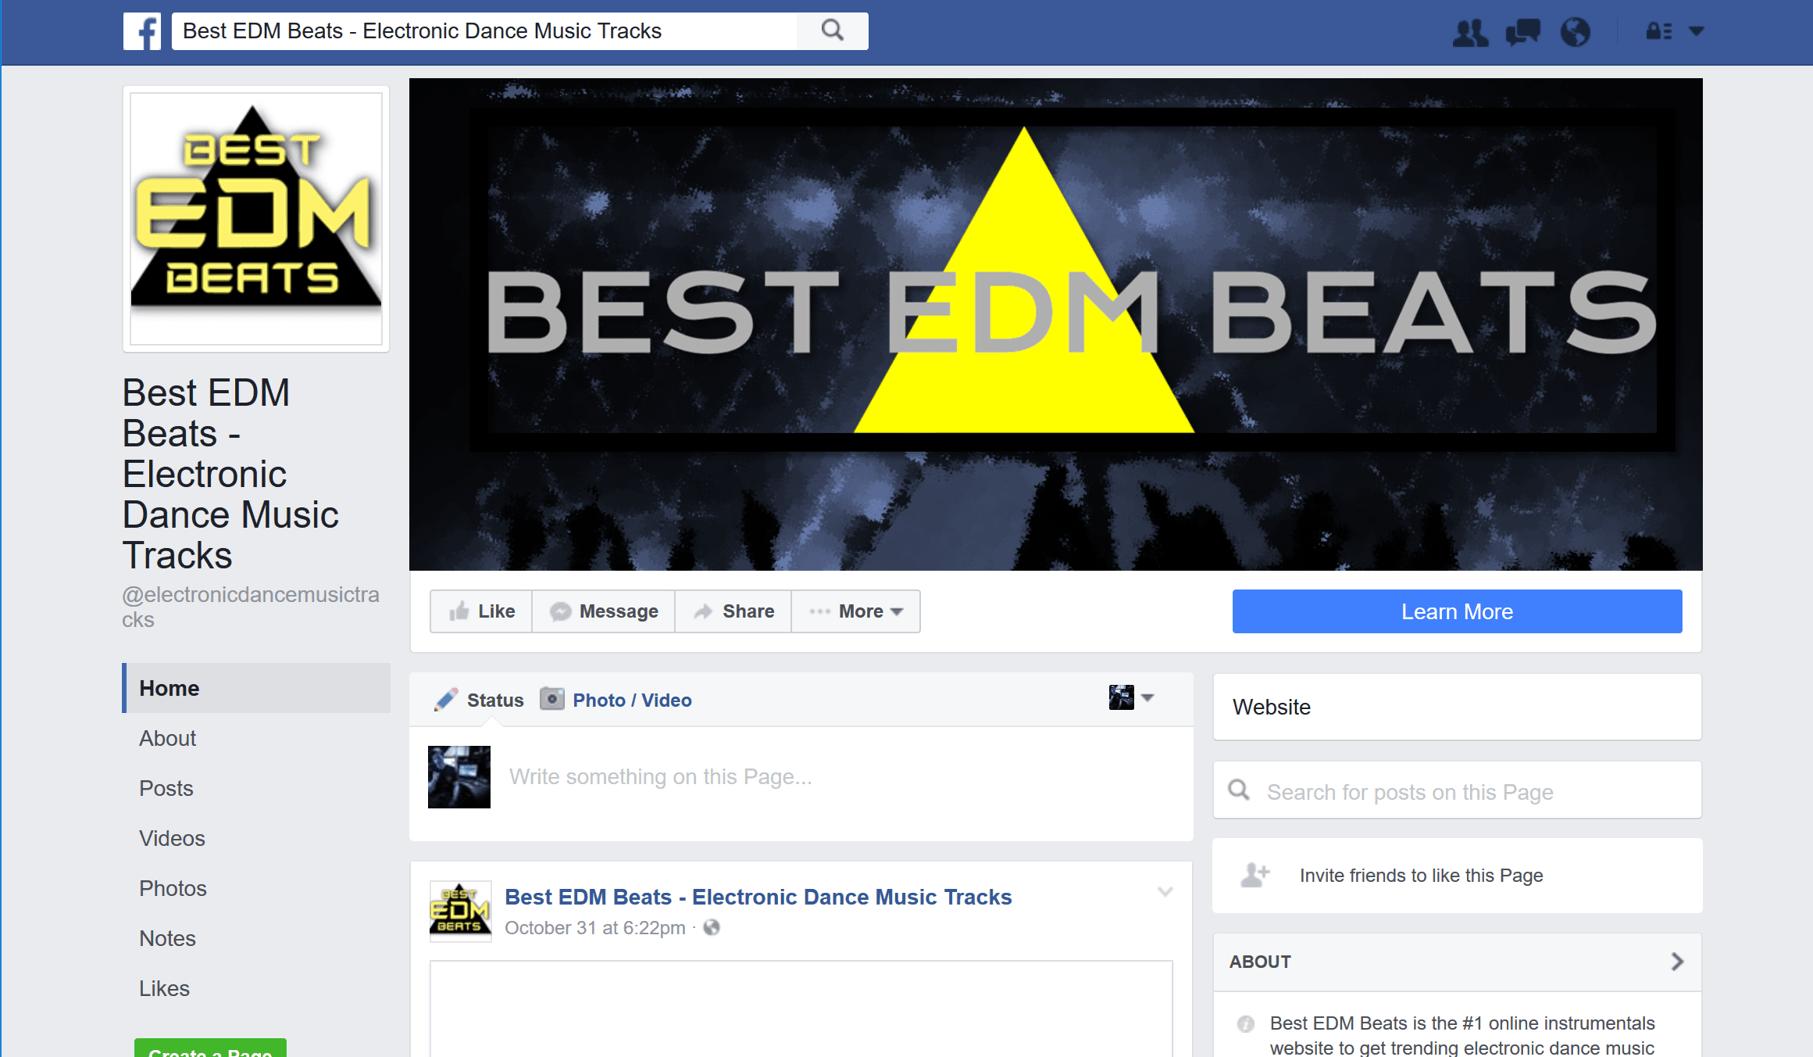 Best EDM Beats | Tropical House | Club Dance Instrumentals - Buy